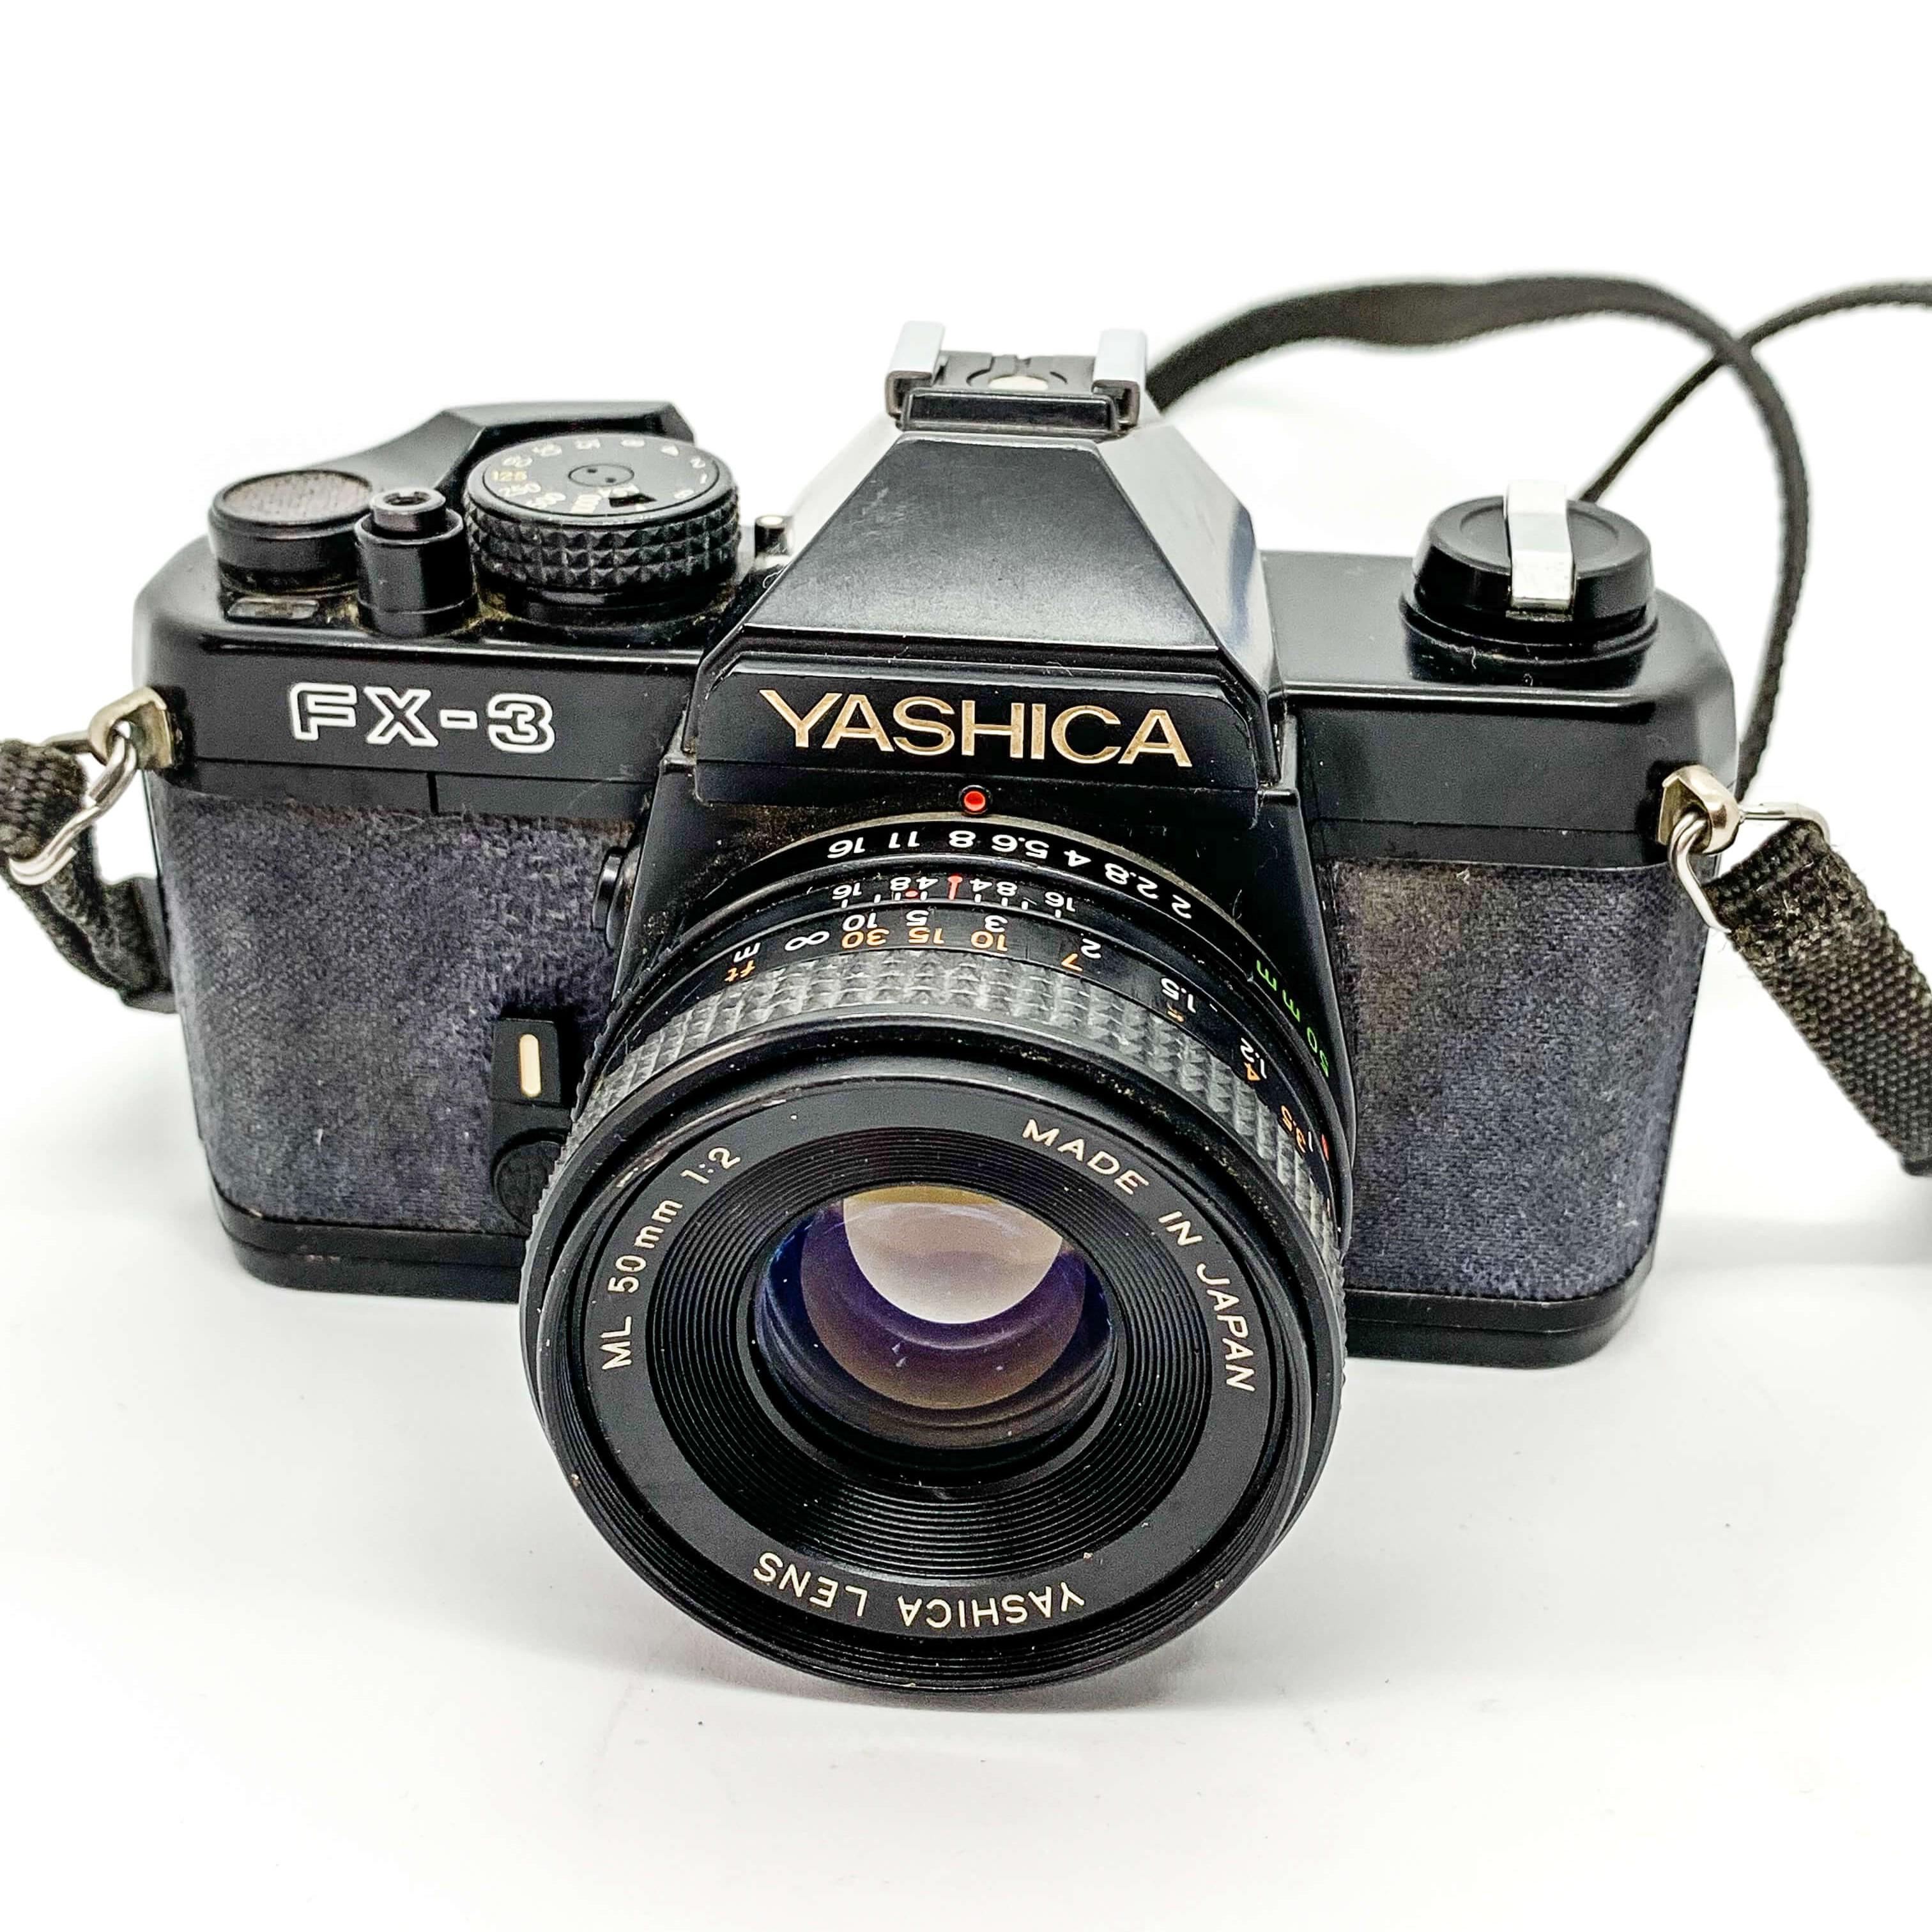 Yahisca FX 3 on white background